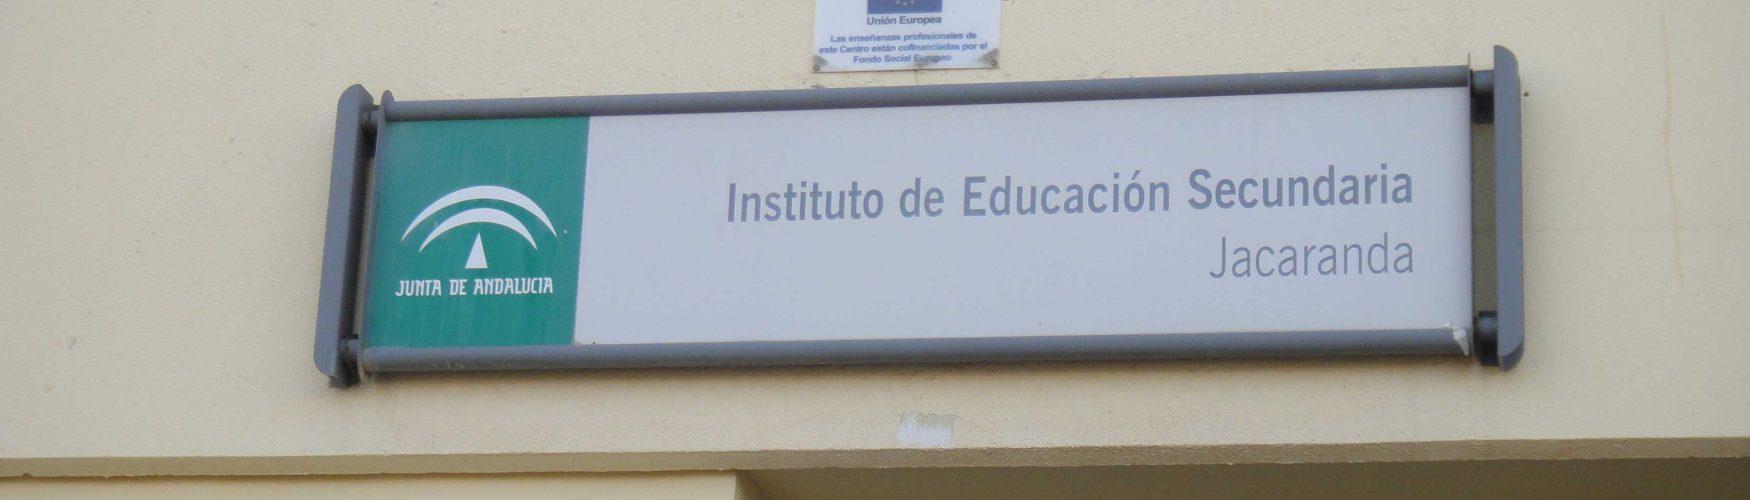 Iesjacaranda Instituto De Educación Secundaria Jacaranda